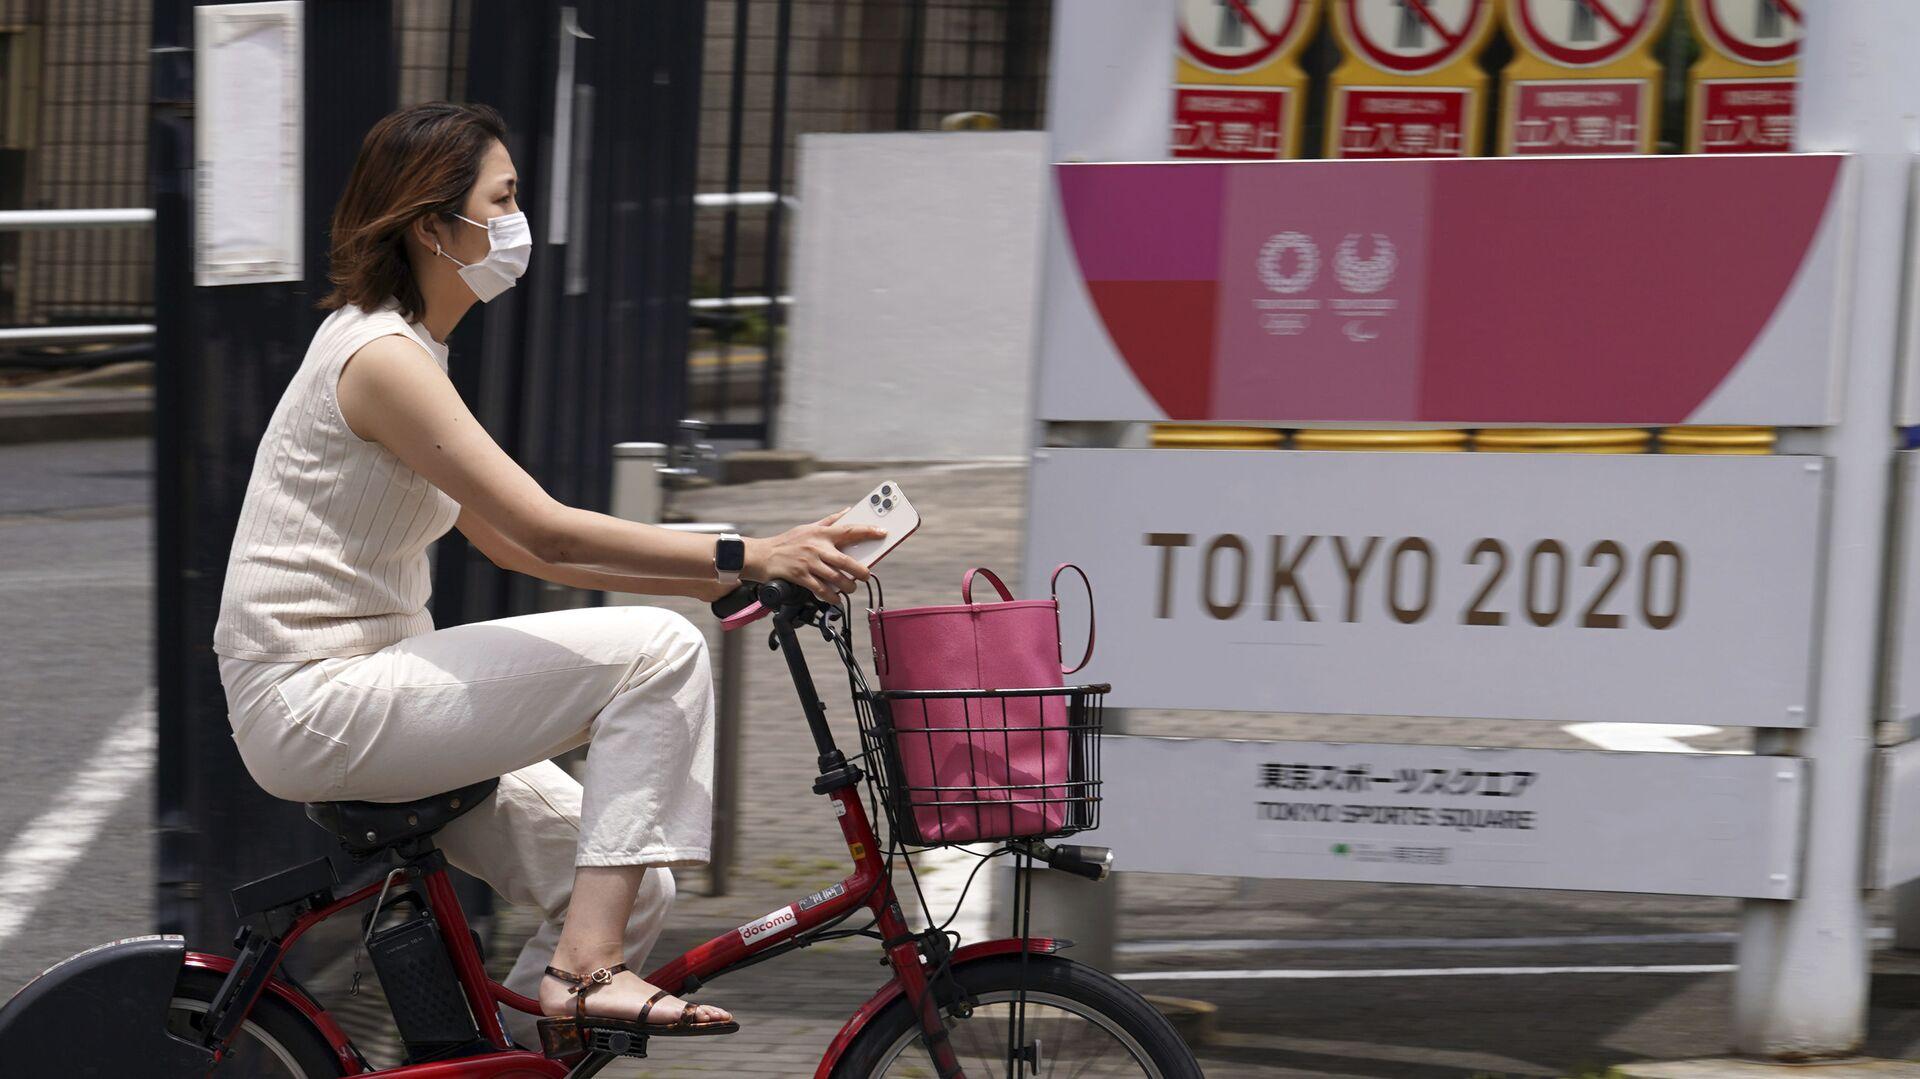 Una donna con mascherina a Tokyo  - Sputnik Italia, 1920, 10.07.2021